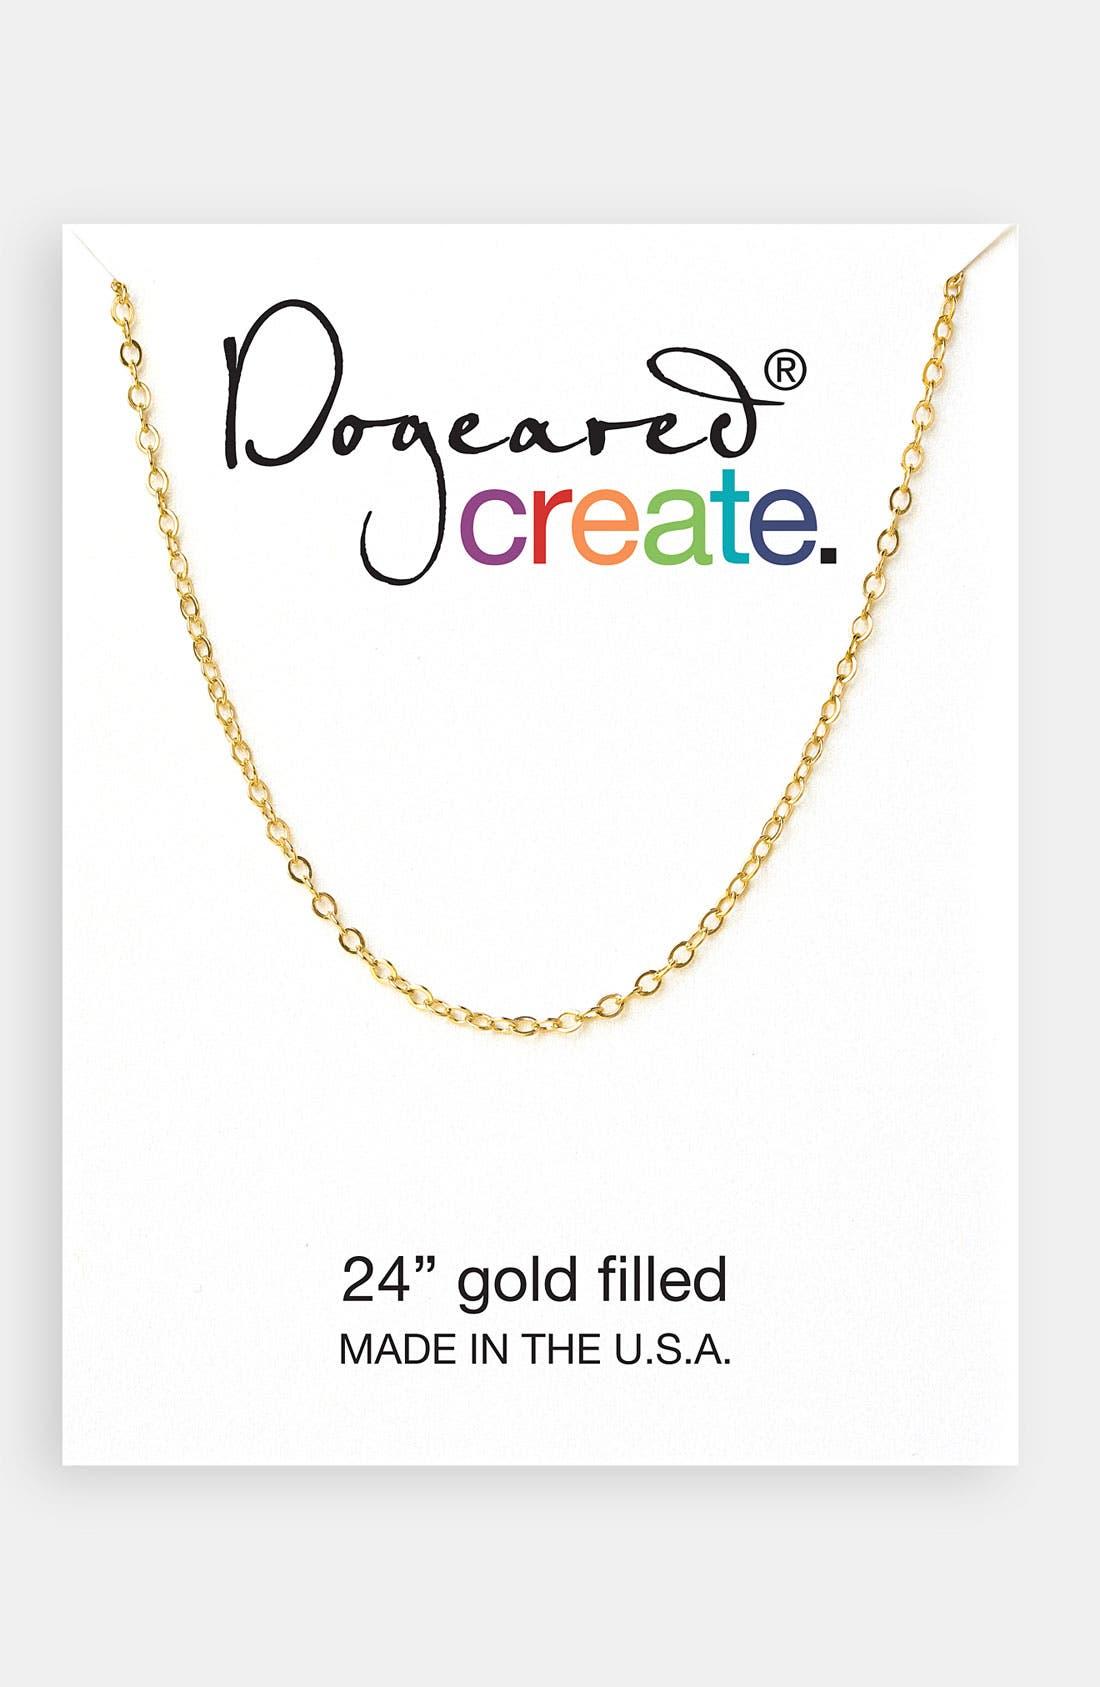 Main Image - Dogeared 'Create' Link Necklace